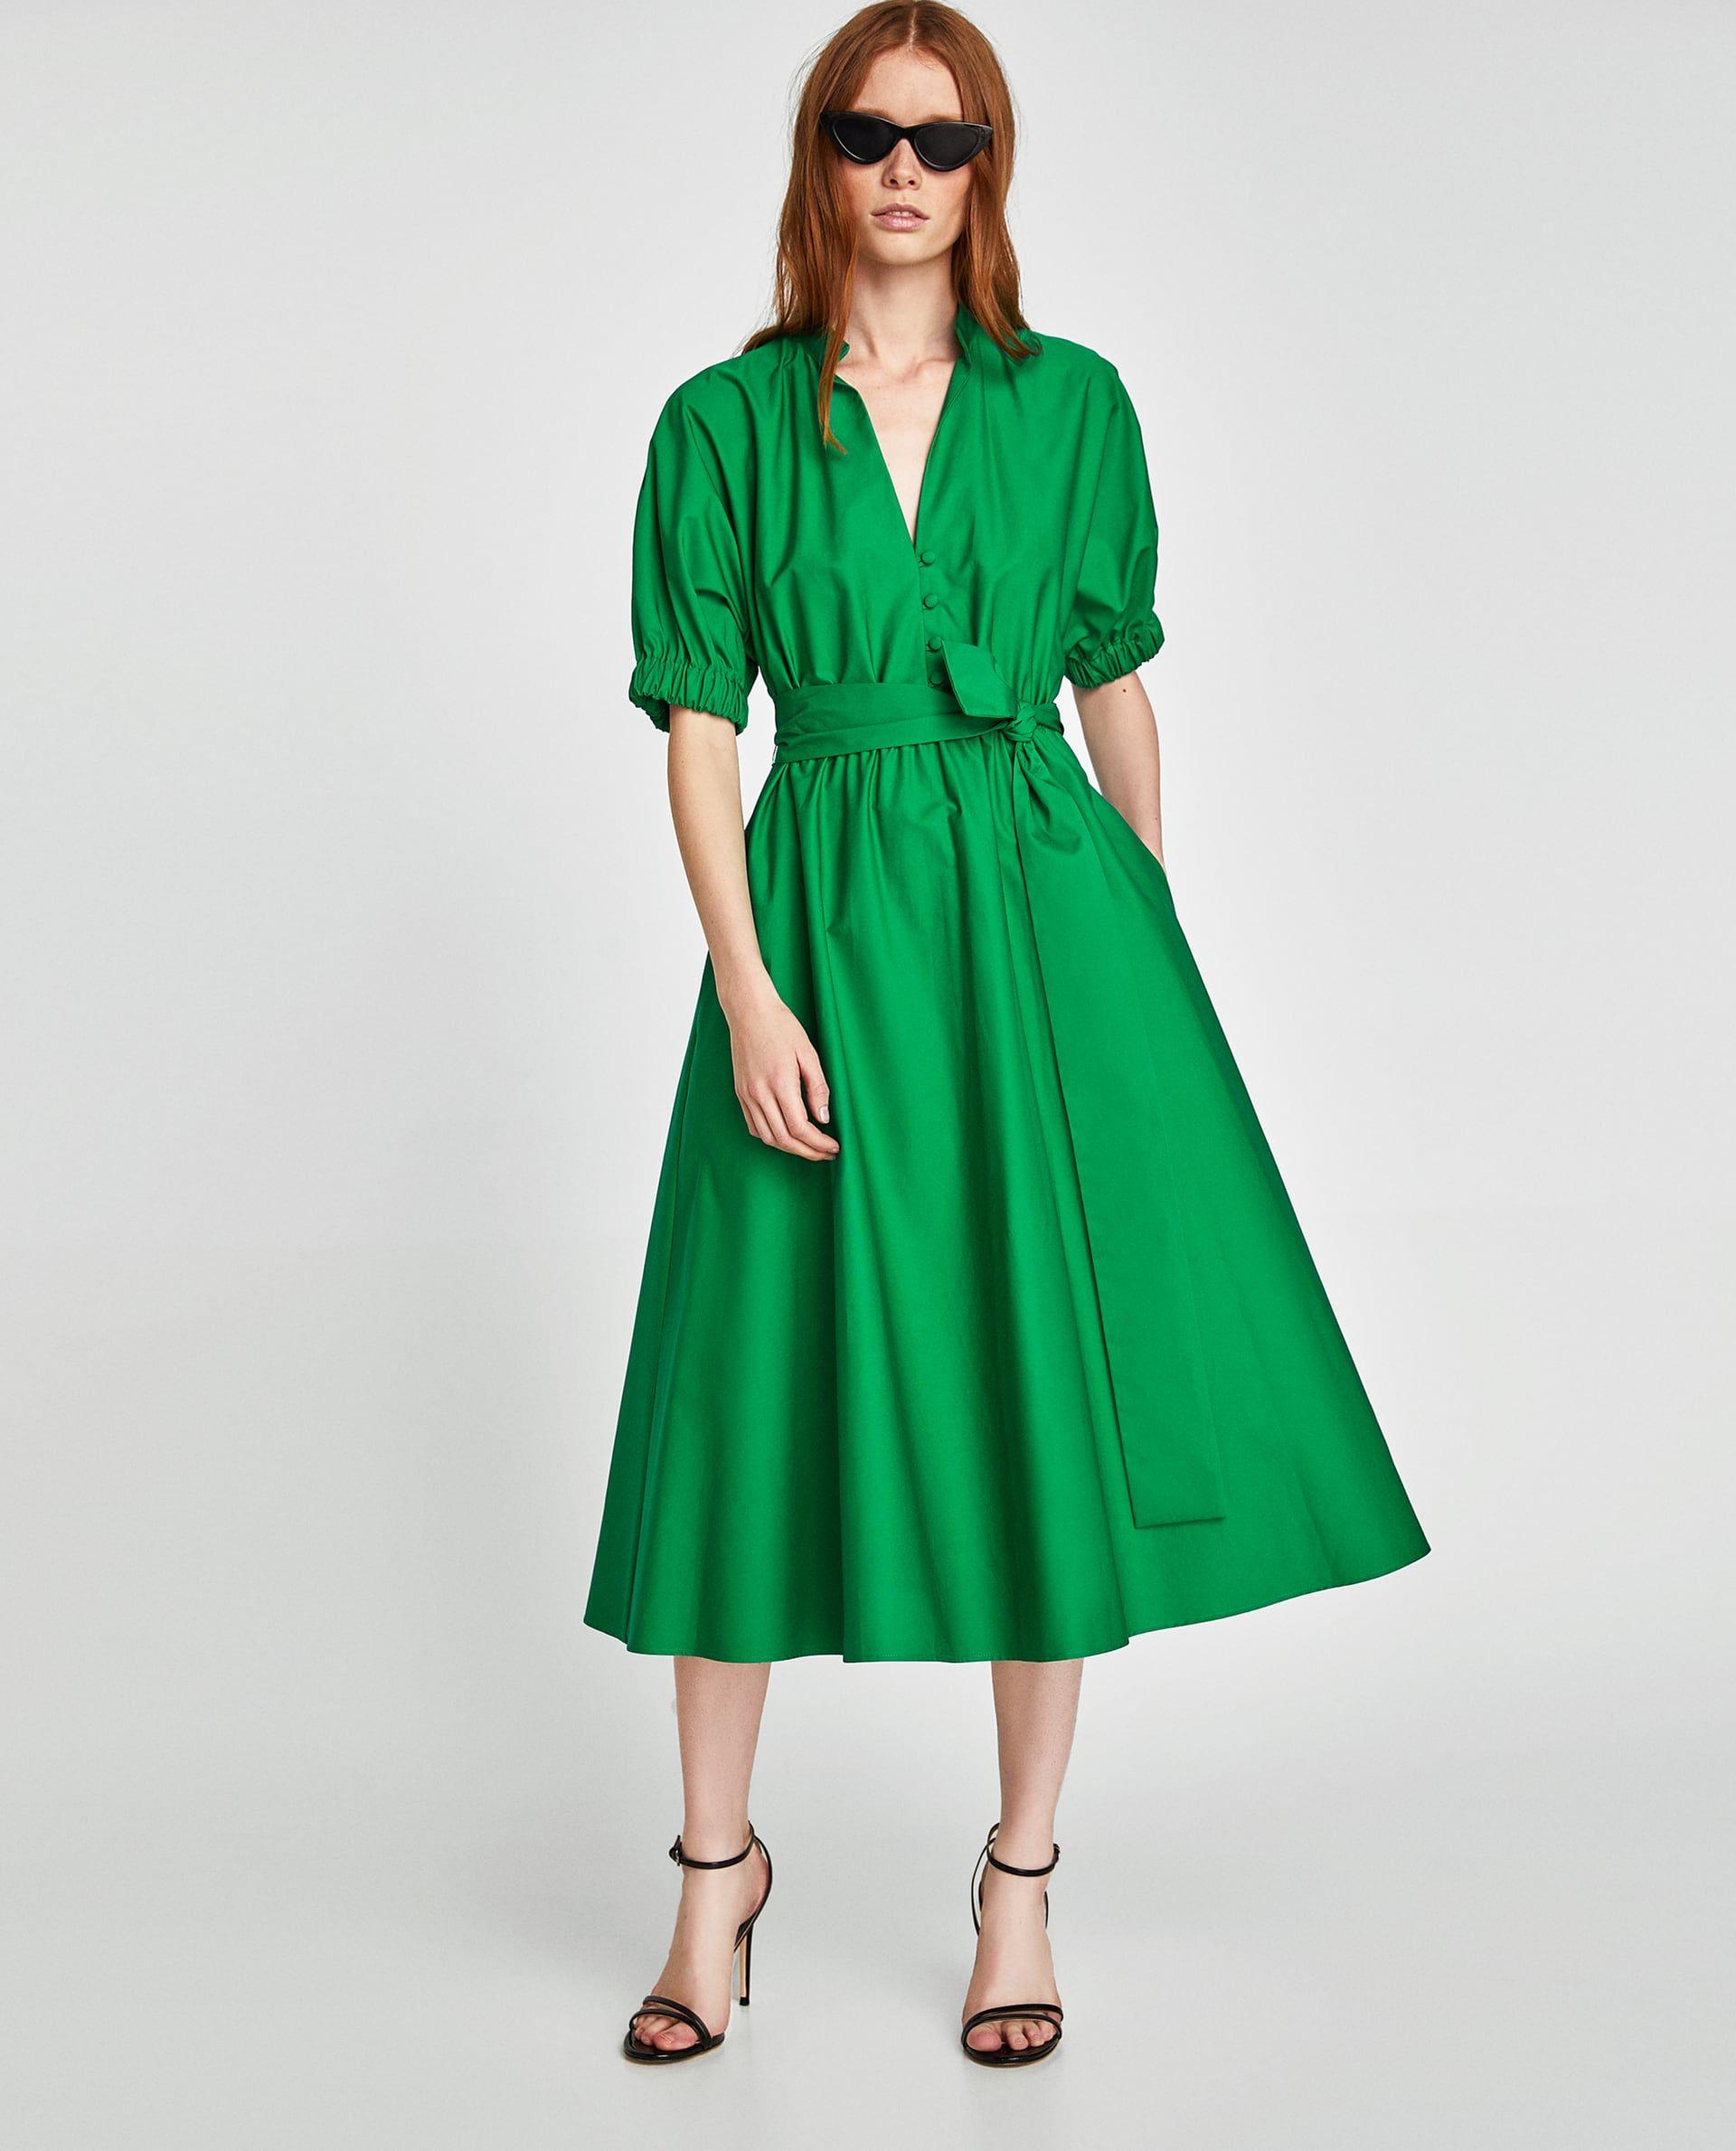 f412bfb72e Zara Green Flowing Midi Skirt – DACC